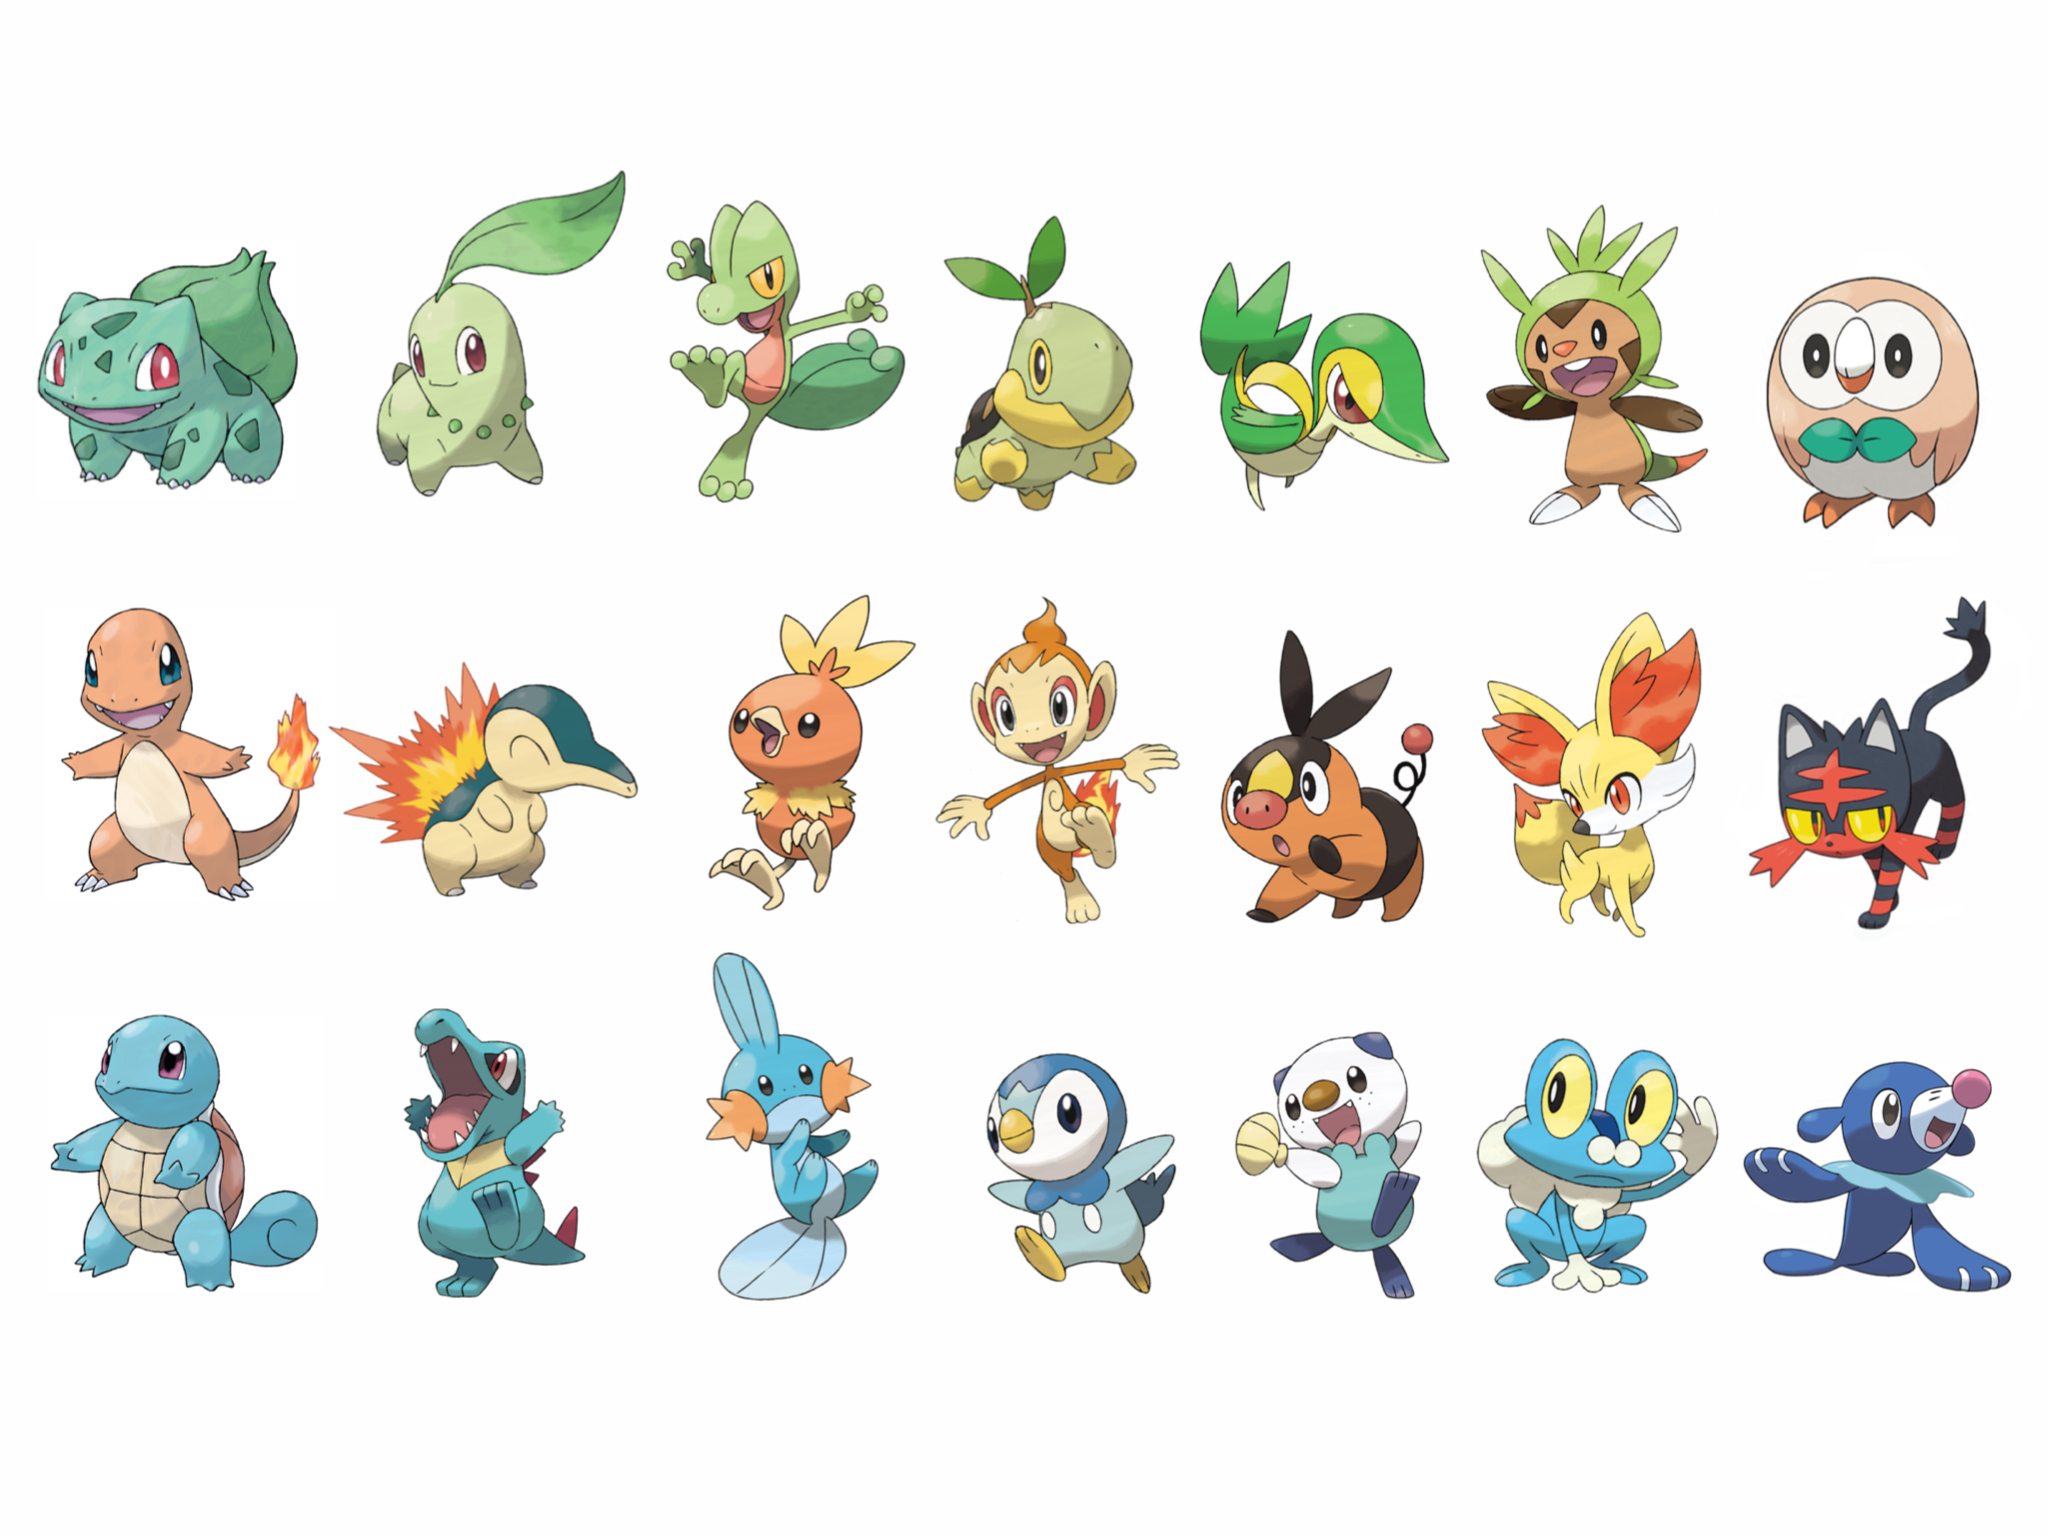 how to get shiny beginner pokemon